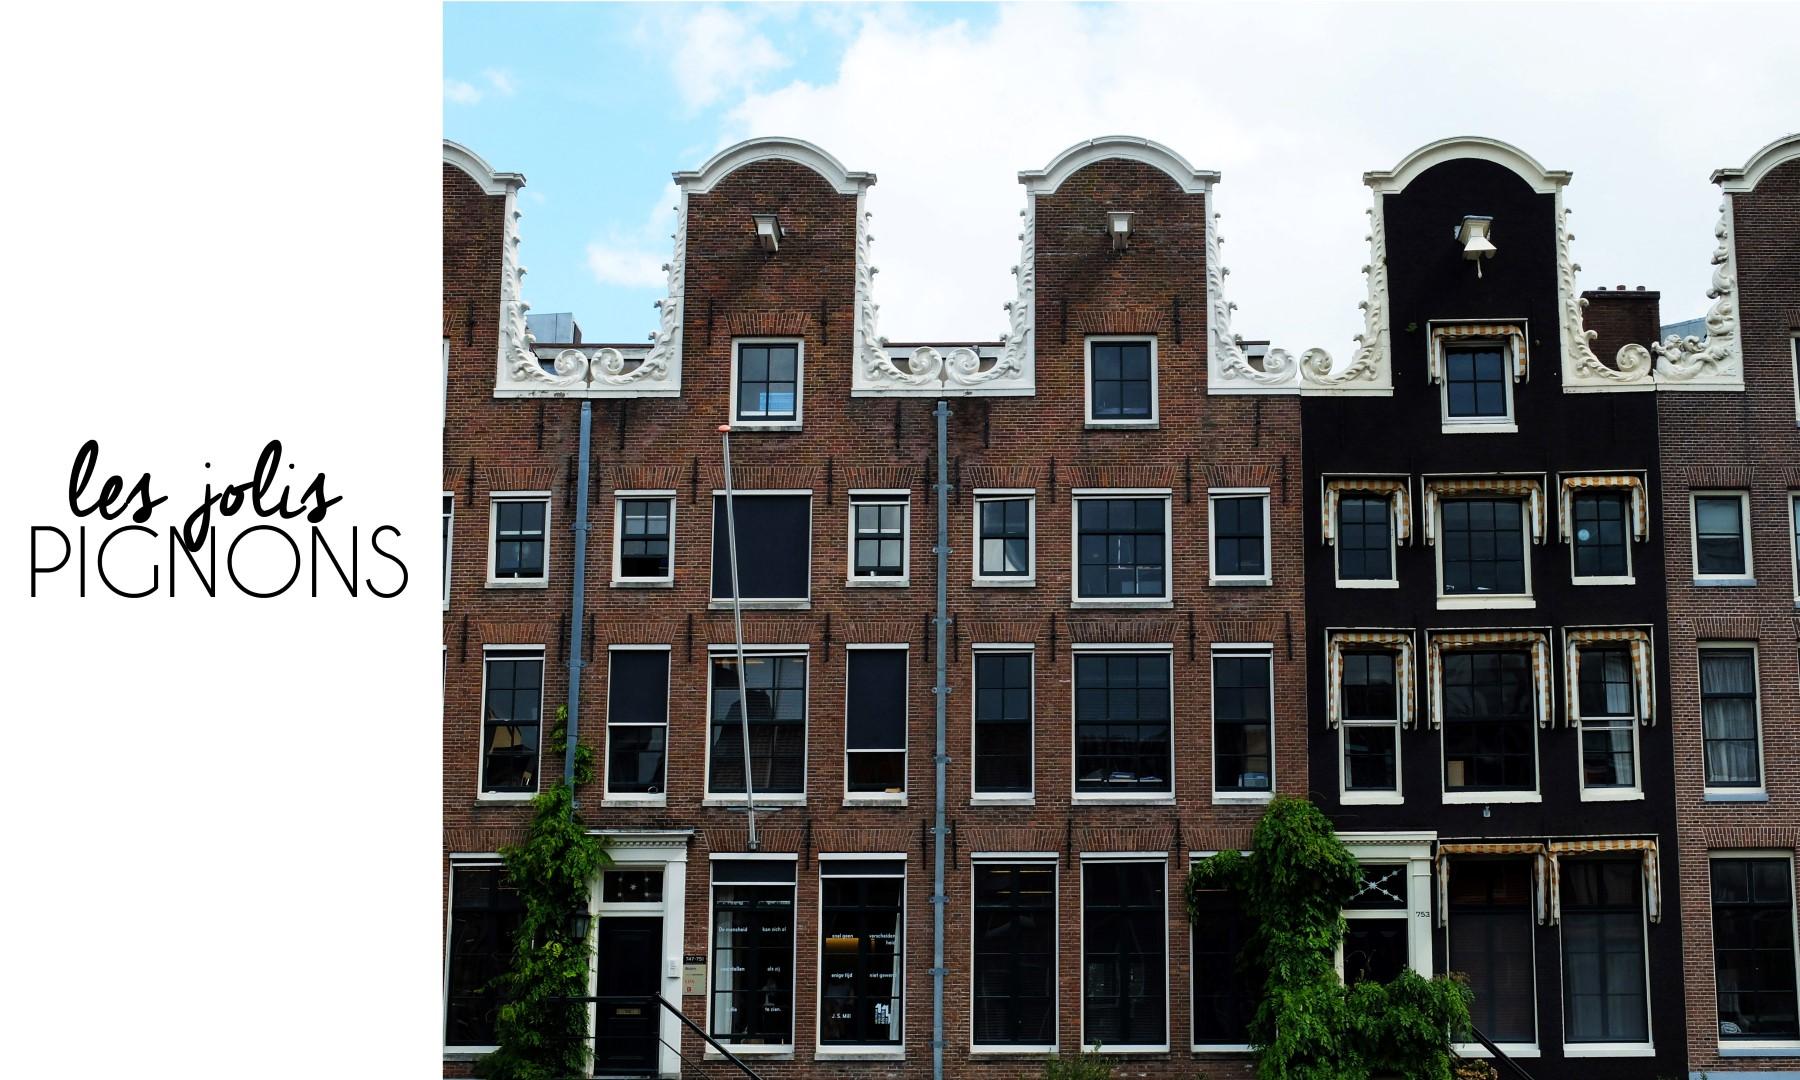 amsterdam_pignons (Large)